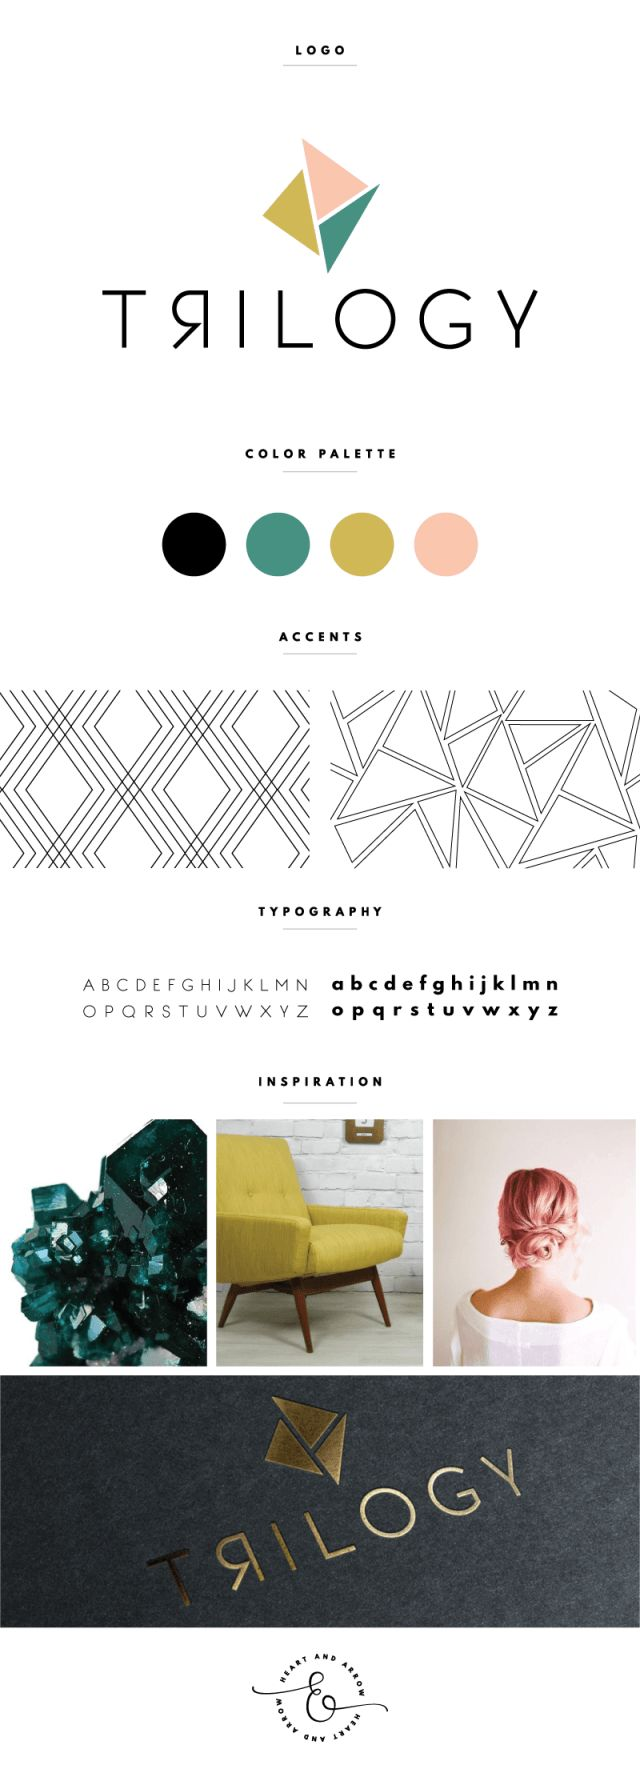 Furniture logo inspiration - Geometric Logo Design Inspiration More